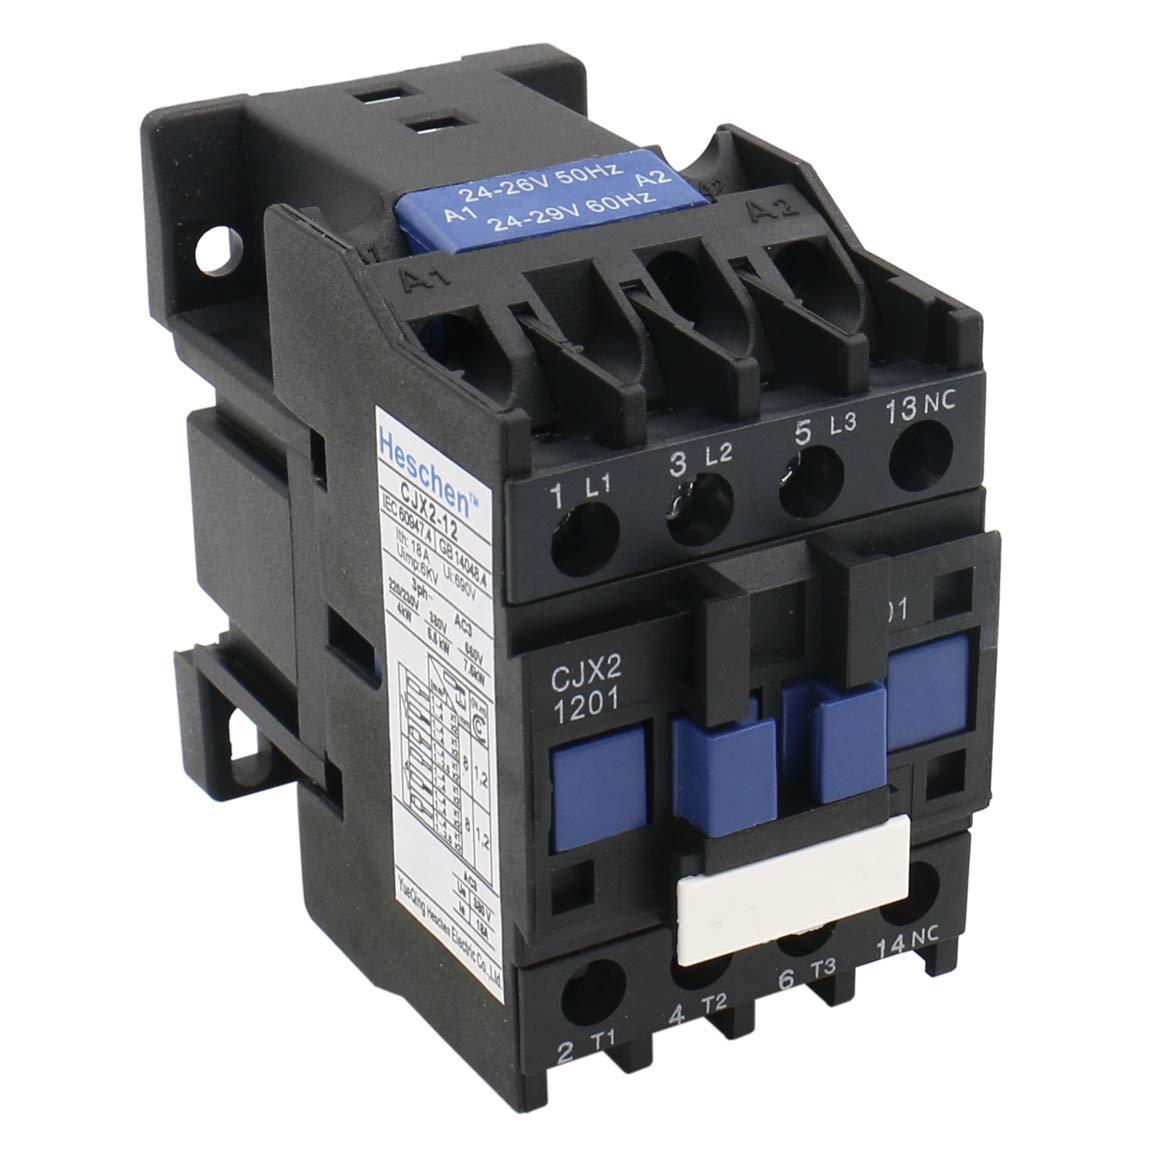 Heschen AC Contactor CJX2-1201 24V 50/60Hz Bobina 3P 3 polos normalmente cerrado 660V 25A